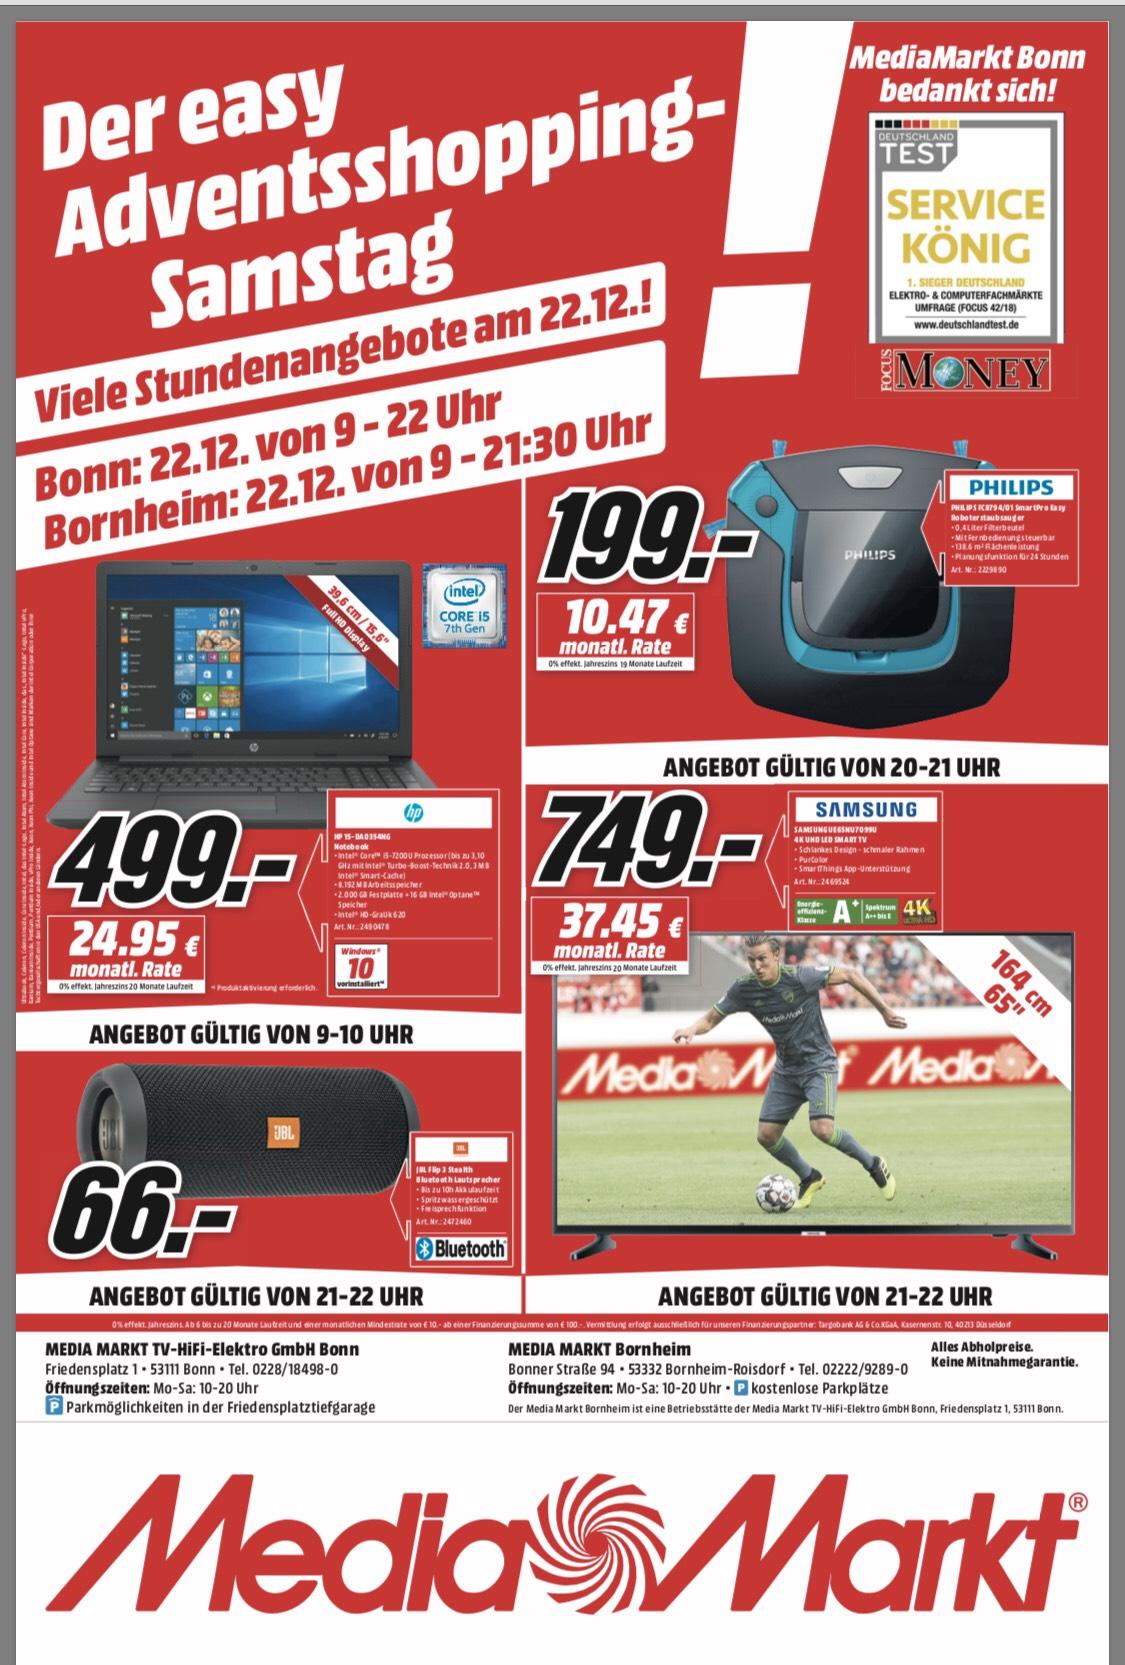 [Lokal MediaMarkt Bonn Bornheim] JBL Flip 3 Samsung UE65NU7099